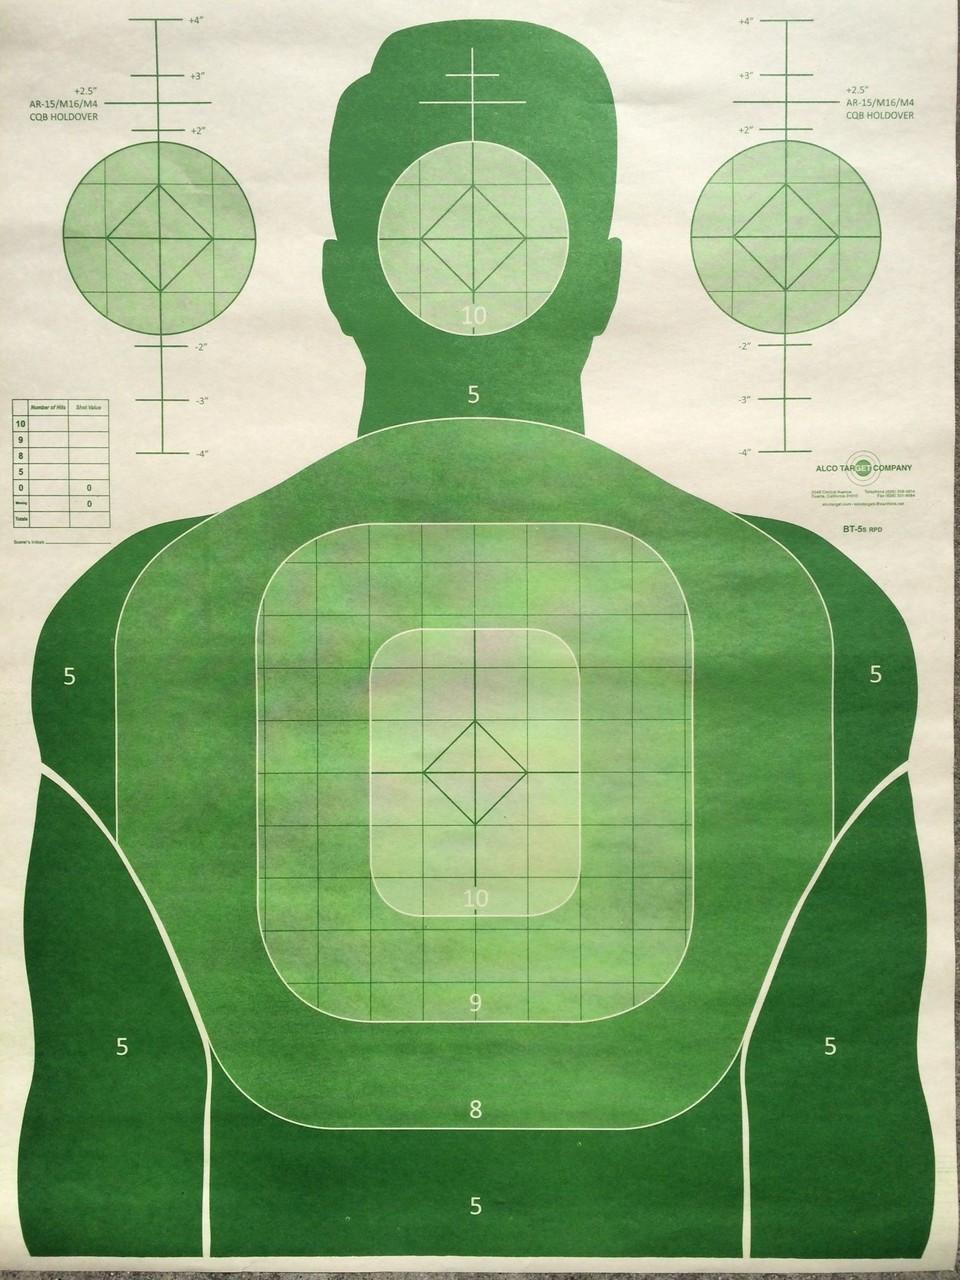 BT-5SB3 Shooting Target Variety Pack